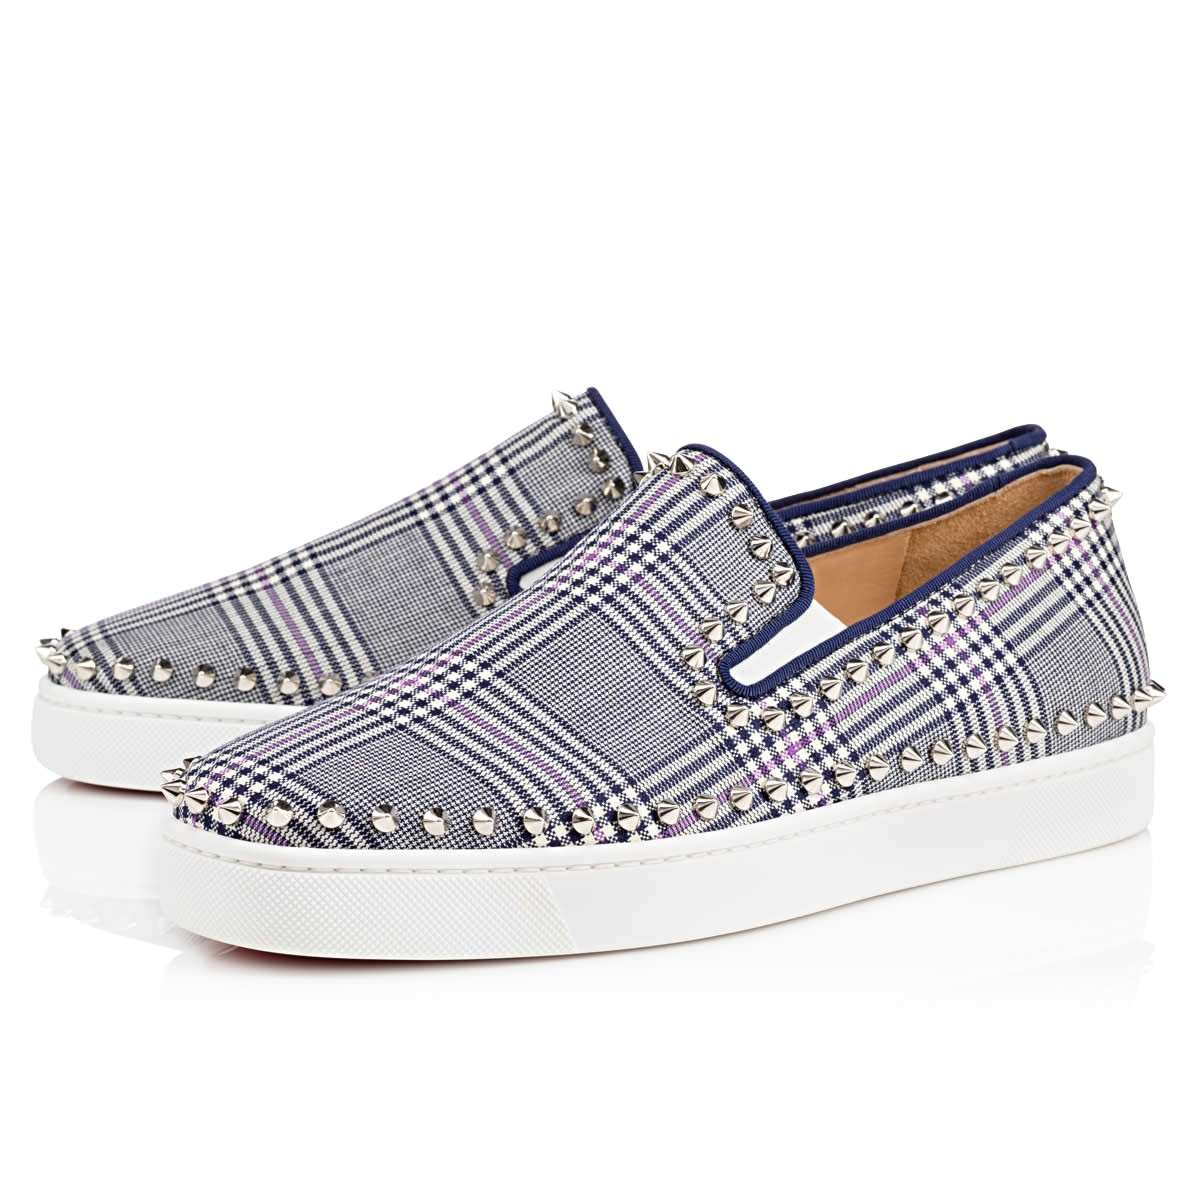 Christian Loubutin Tartan Shoes Pik Boat